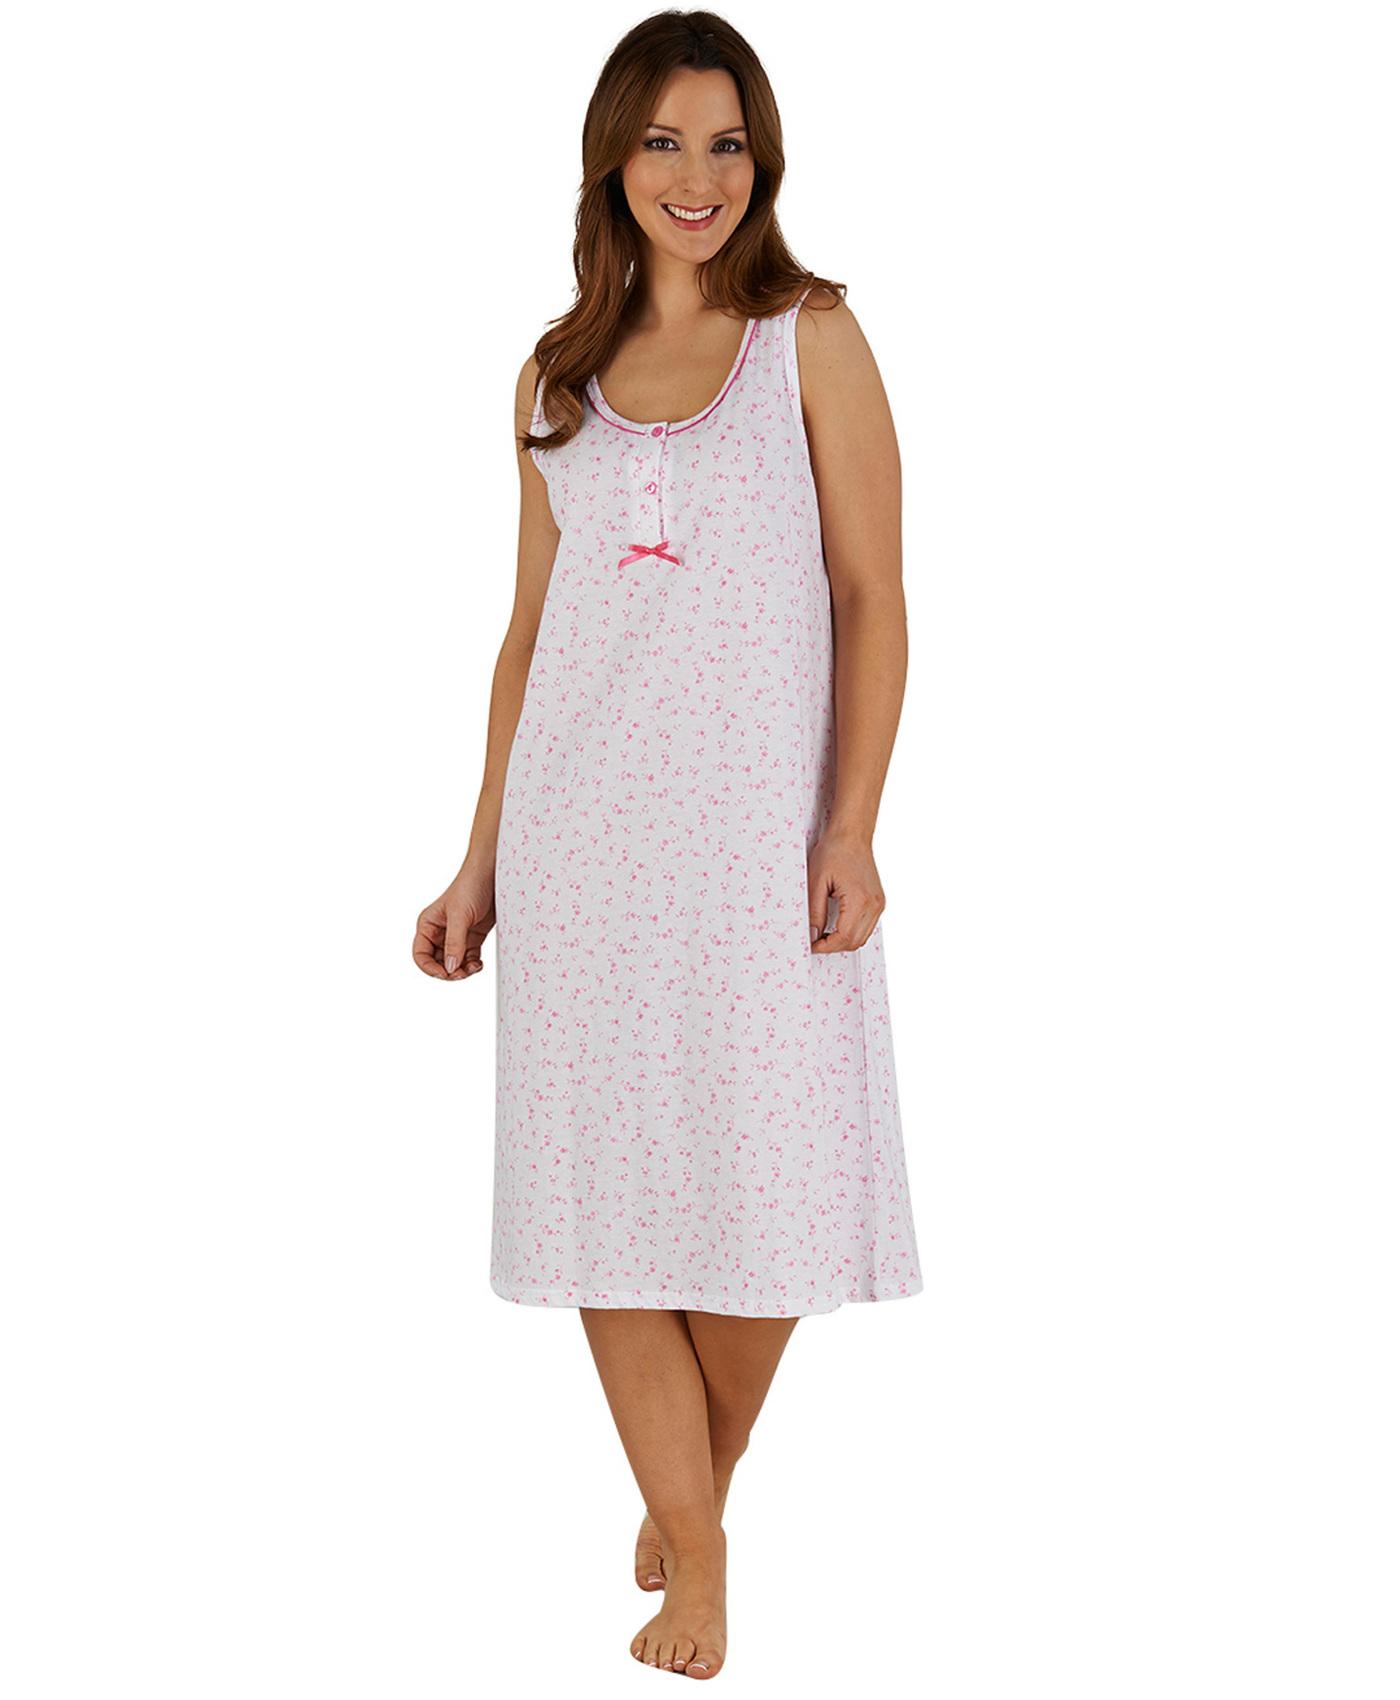 ladies slenderella 100 cotton floral nightdress. Black Bedroom Furniture Sets. Home Design Ideas